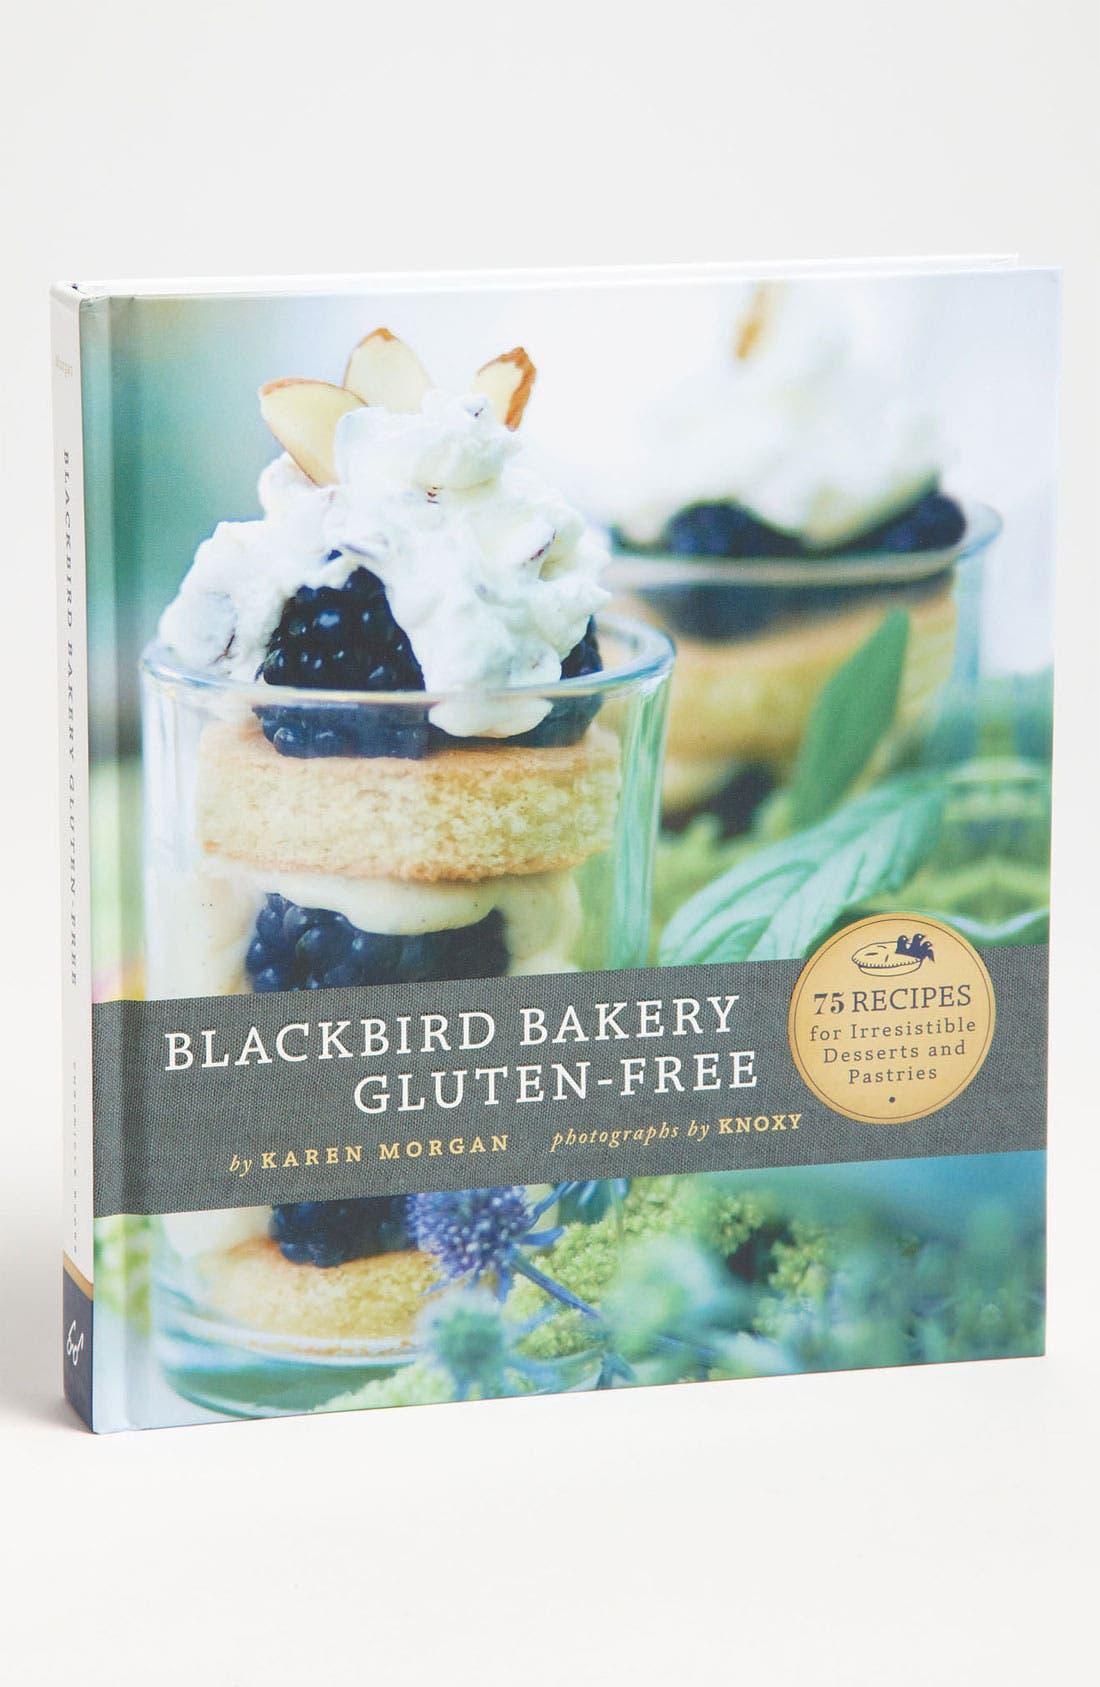 Main Image - 'Blackbird Bakery Gluten-Free' Cookbook